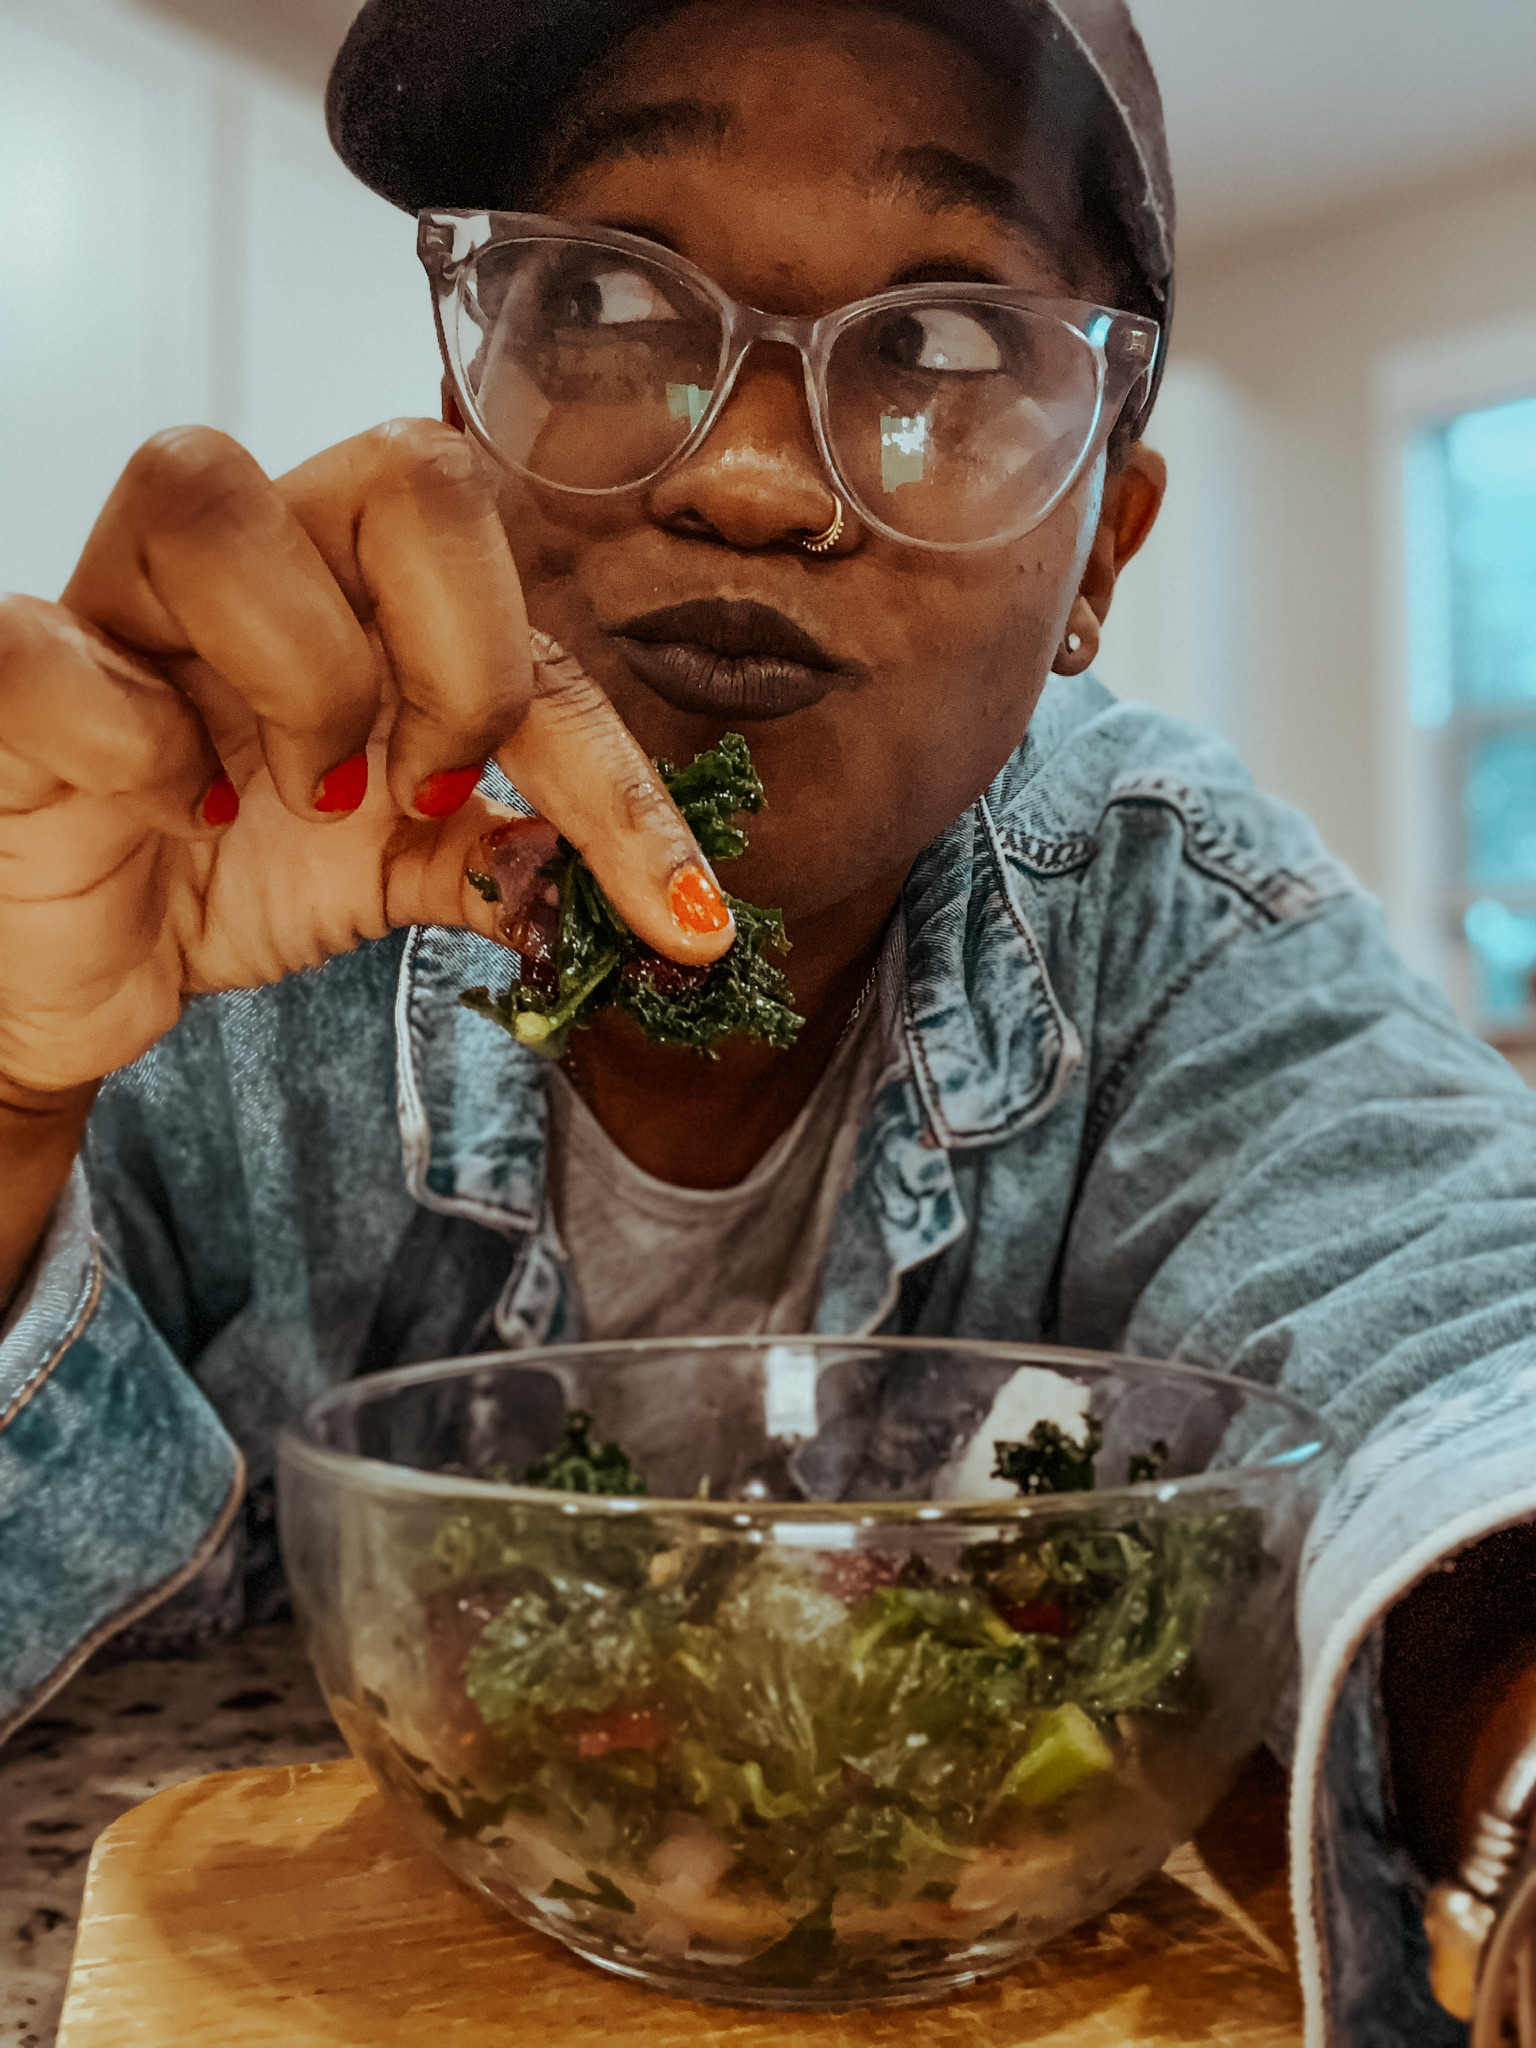 vegan kale greens